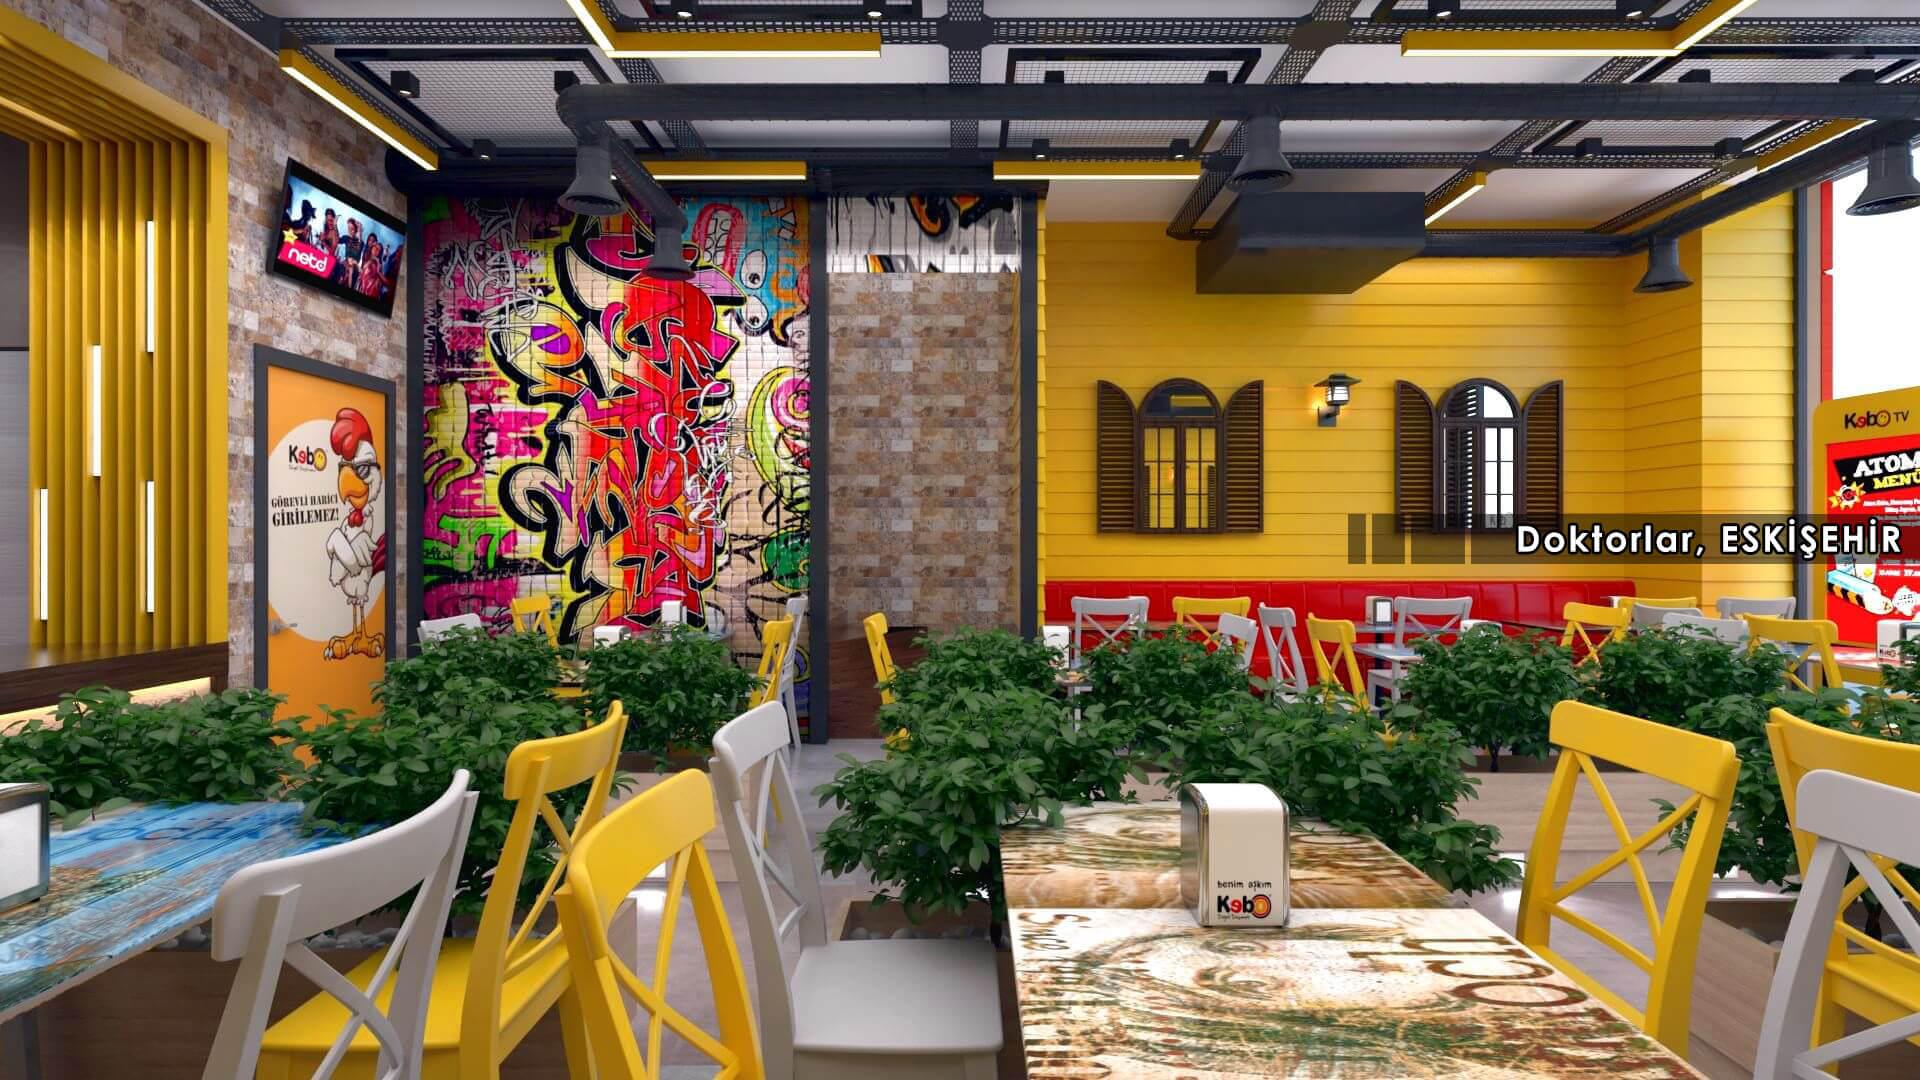 Restaurant interior design Kebo 2018